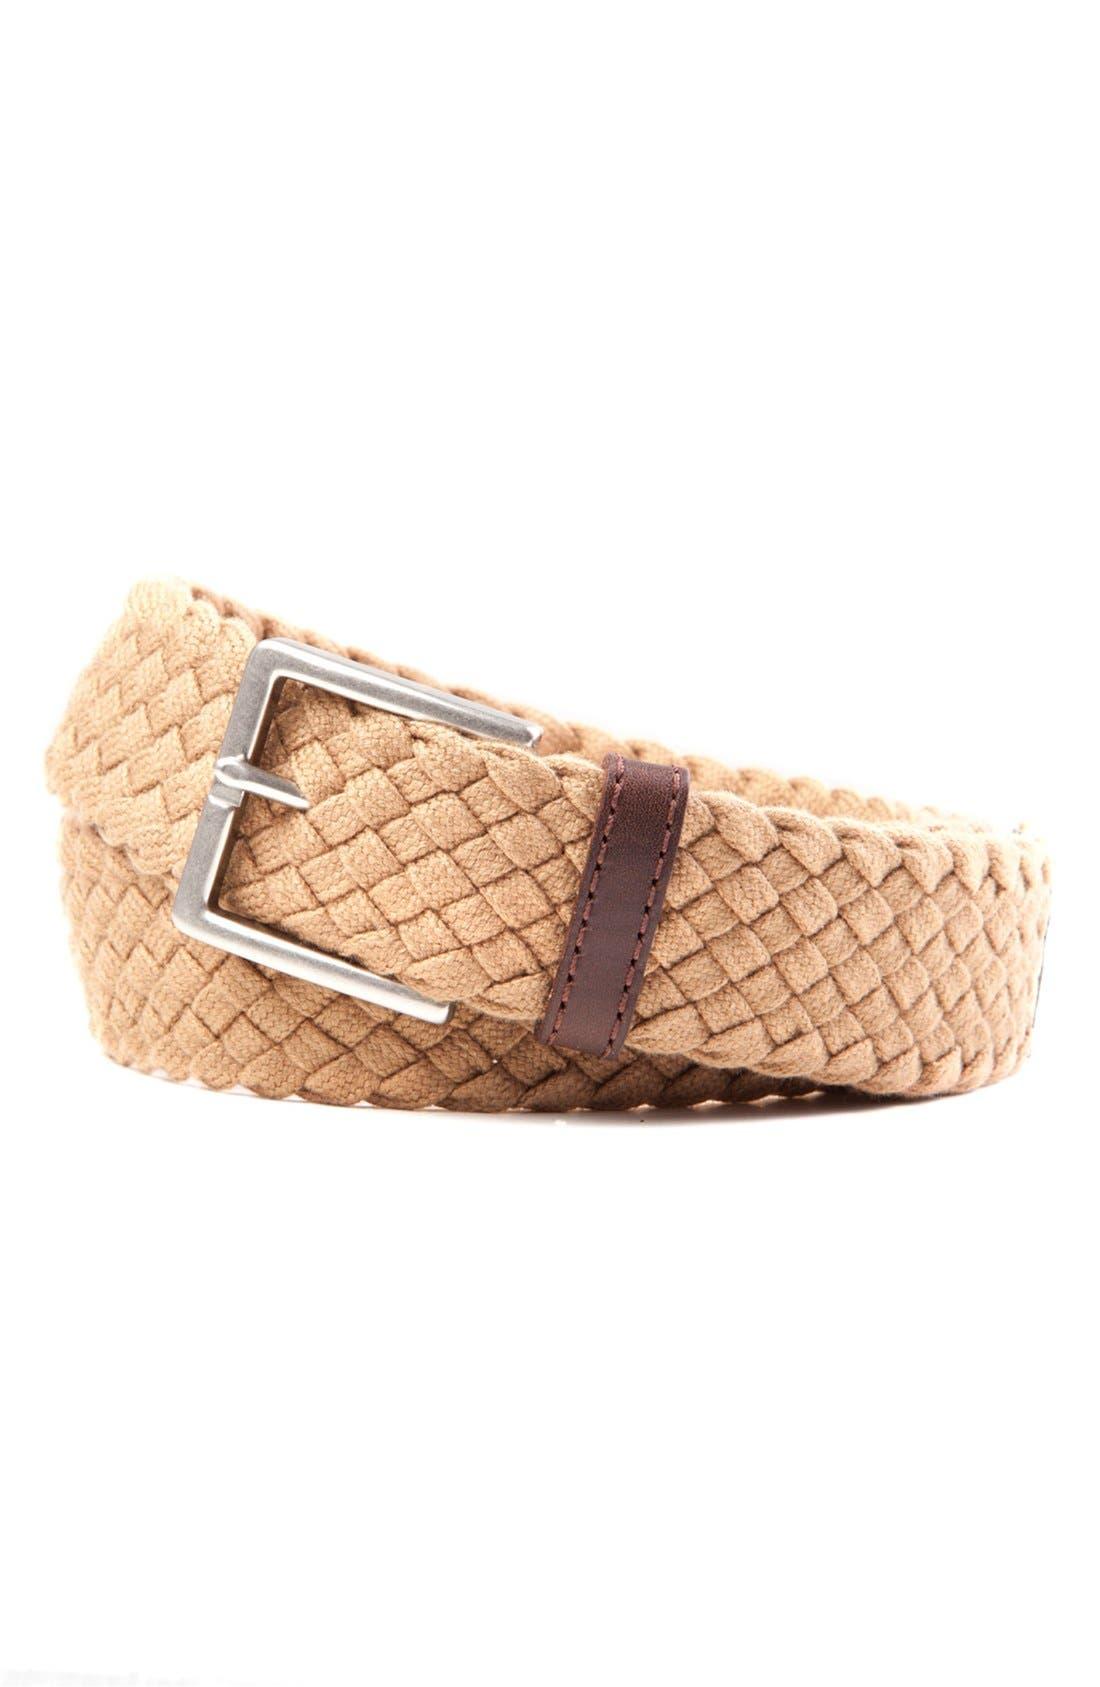 Alternate Image 1 Selected - Tommy Bahama Braided Cotton Belt